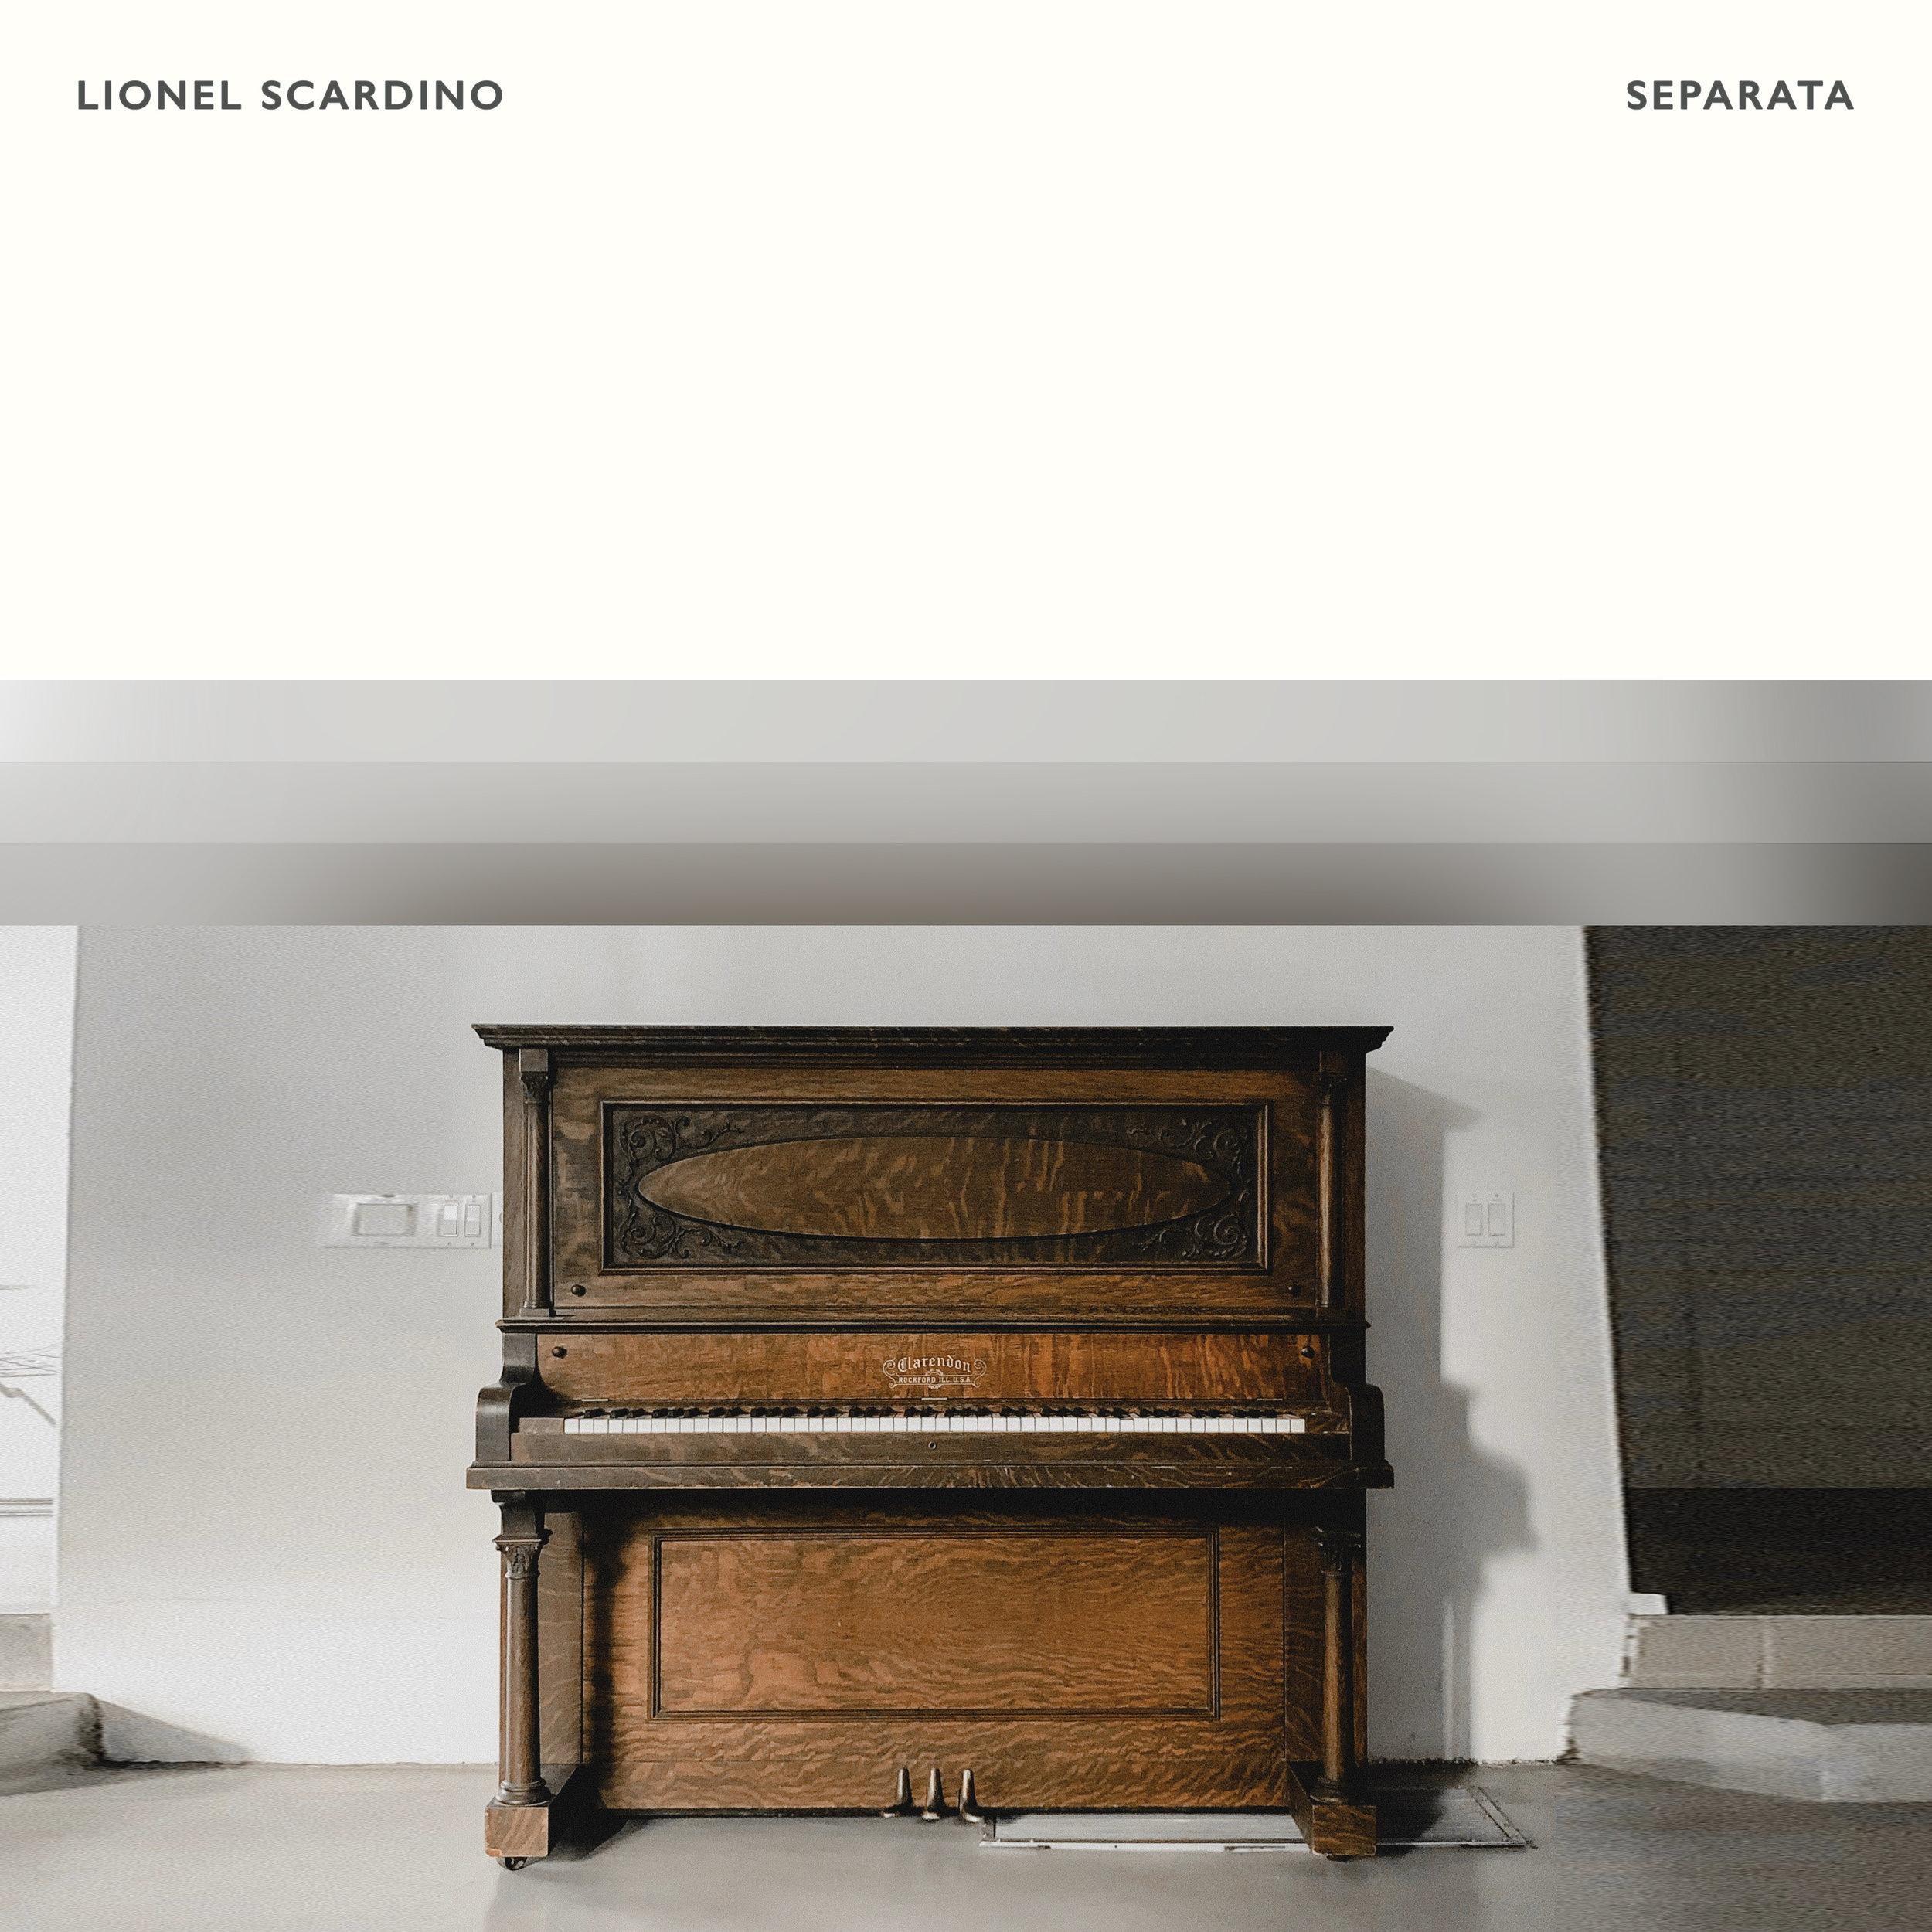 Lionel Scardino - Separata